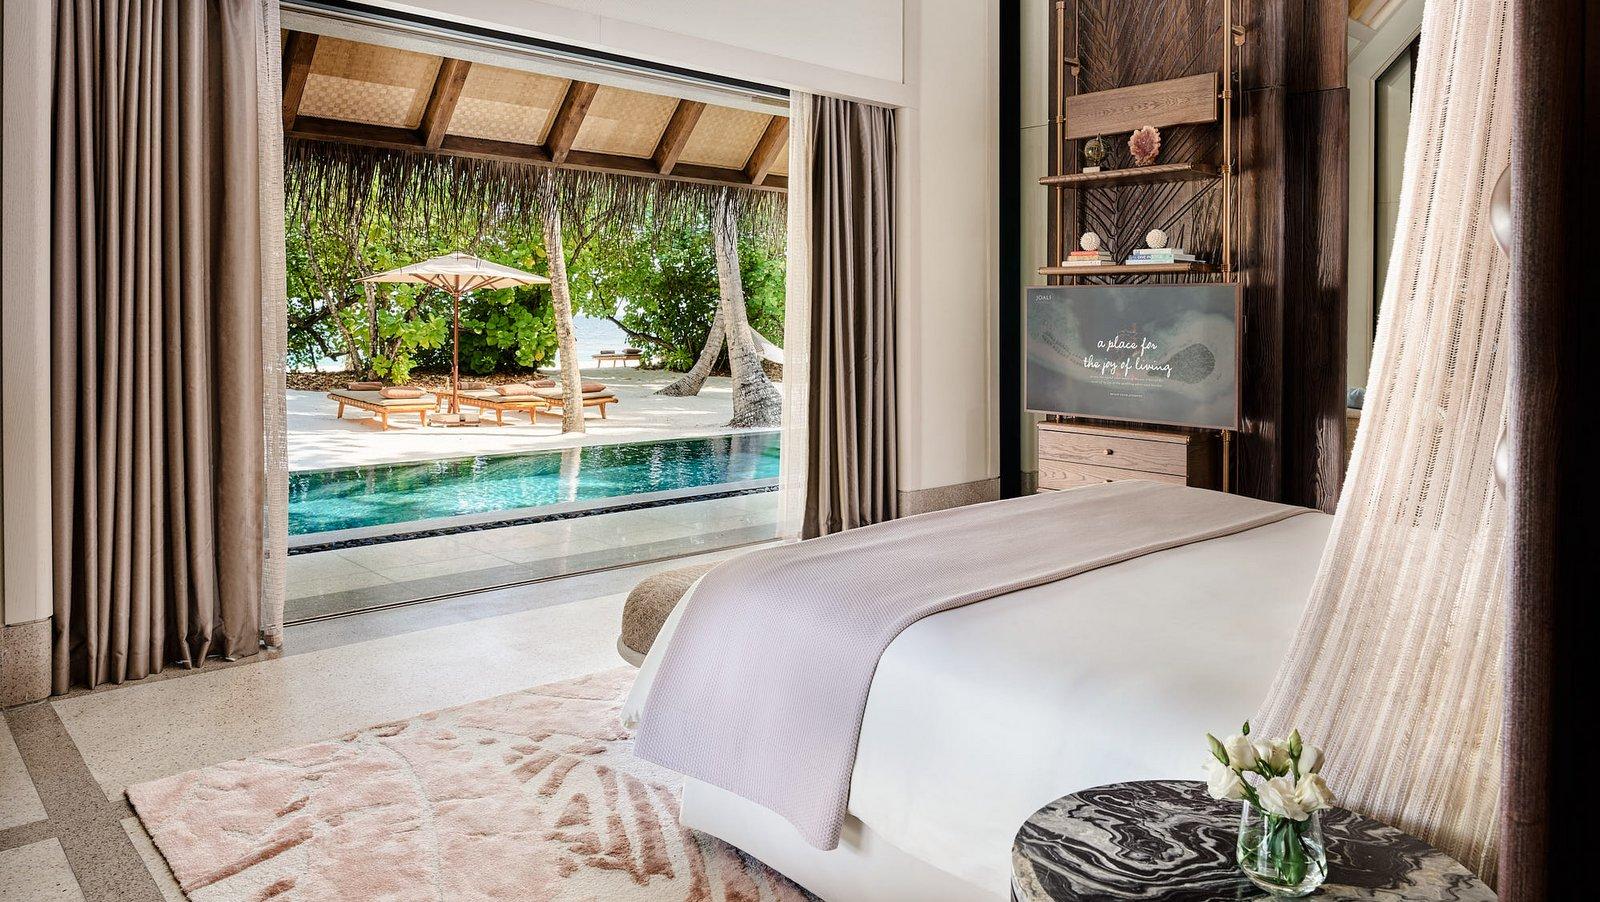 Мальдивы, отель Joali Maldives, номер Two Bed Room Luxury Beach Villa with Two Pool